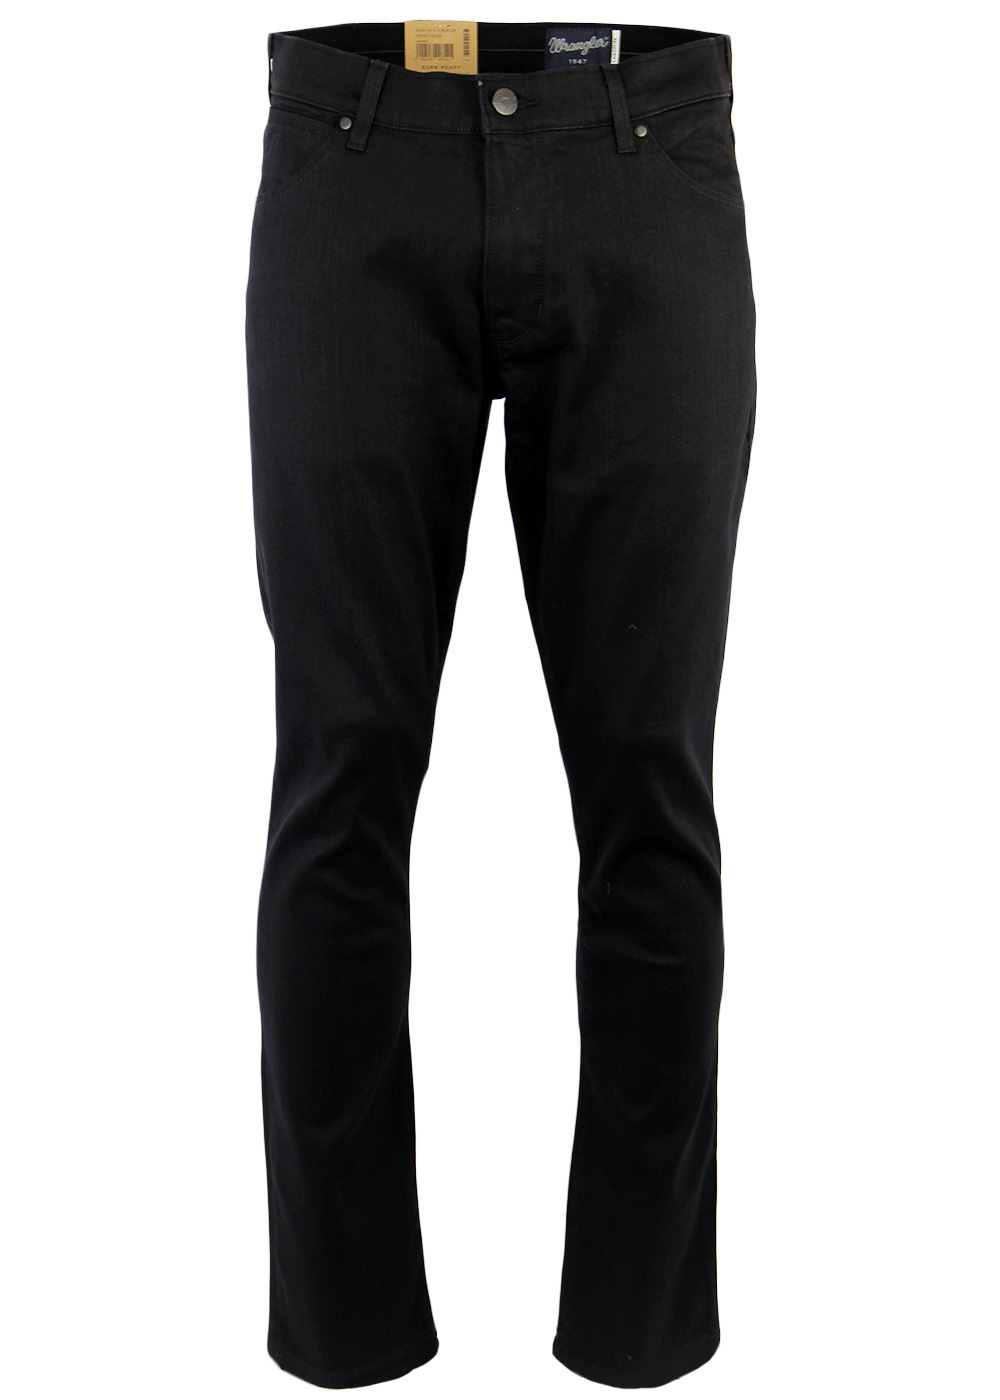 Larston WRANGLER Retro Indie Slim Fit Denim Jeans